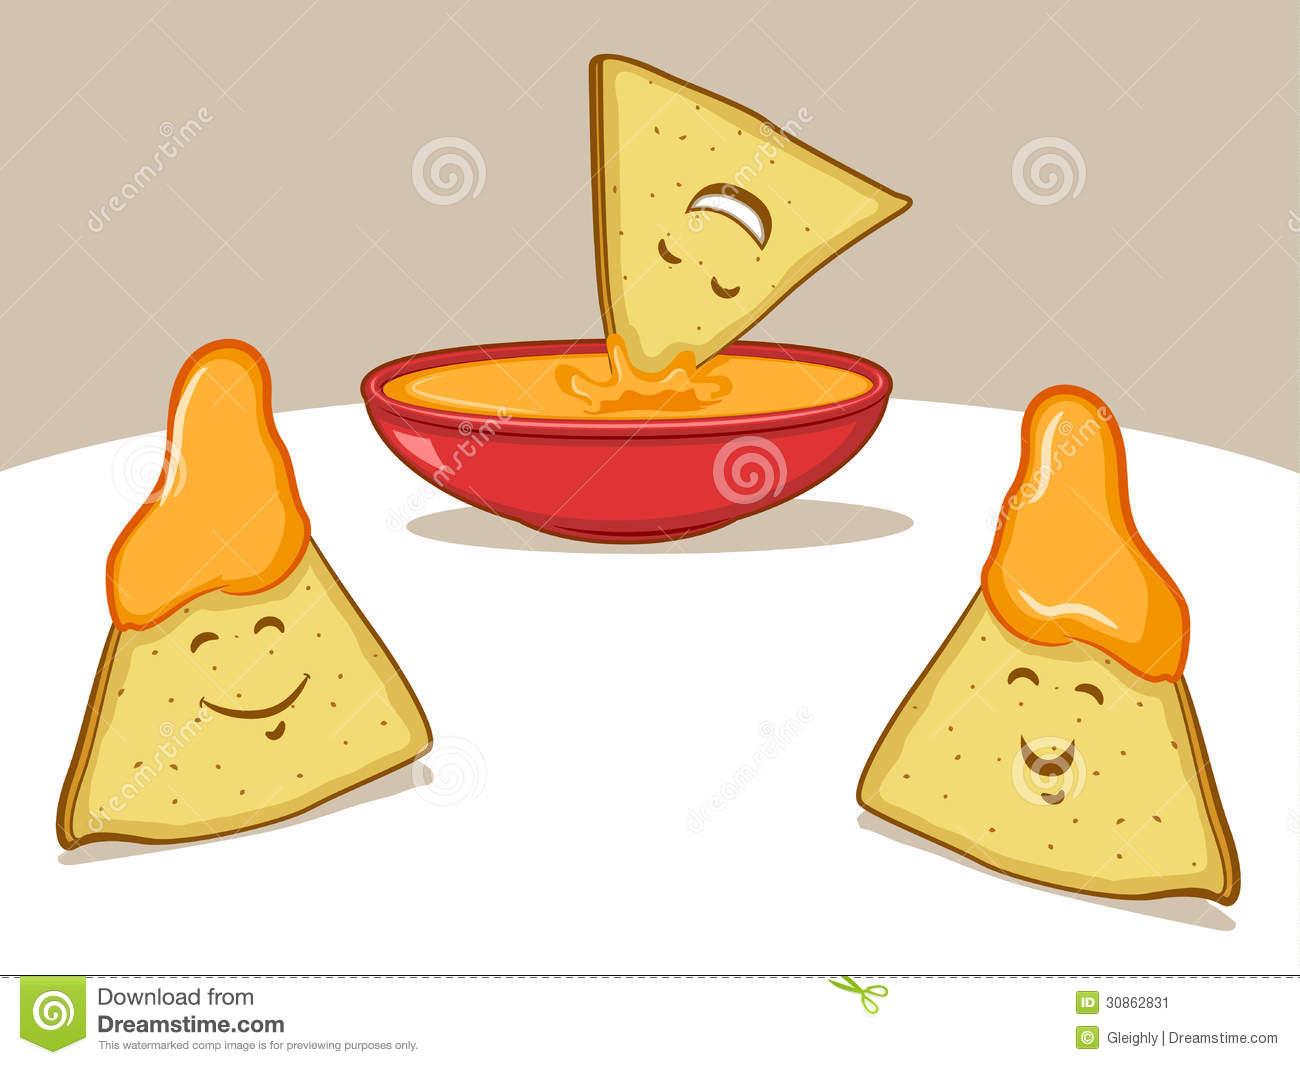 Tortilla clipart cute Hot cliparts Clipart Tortilla Steaming